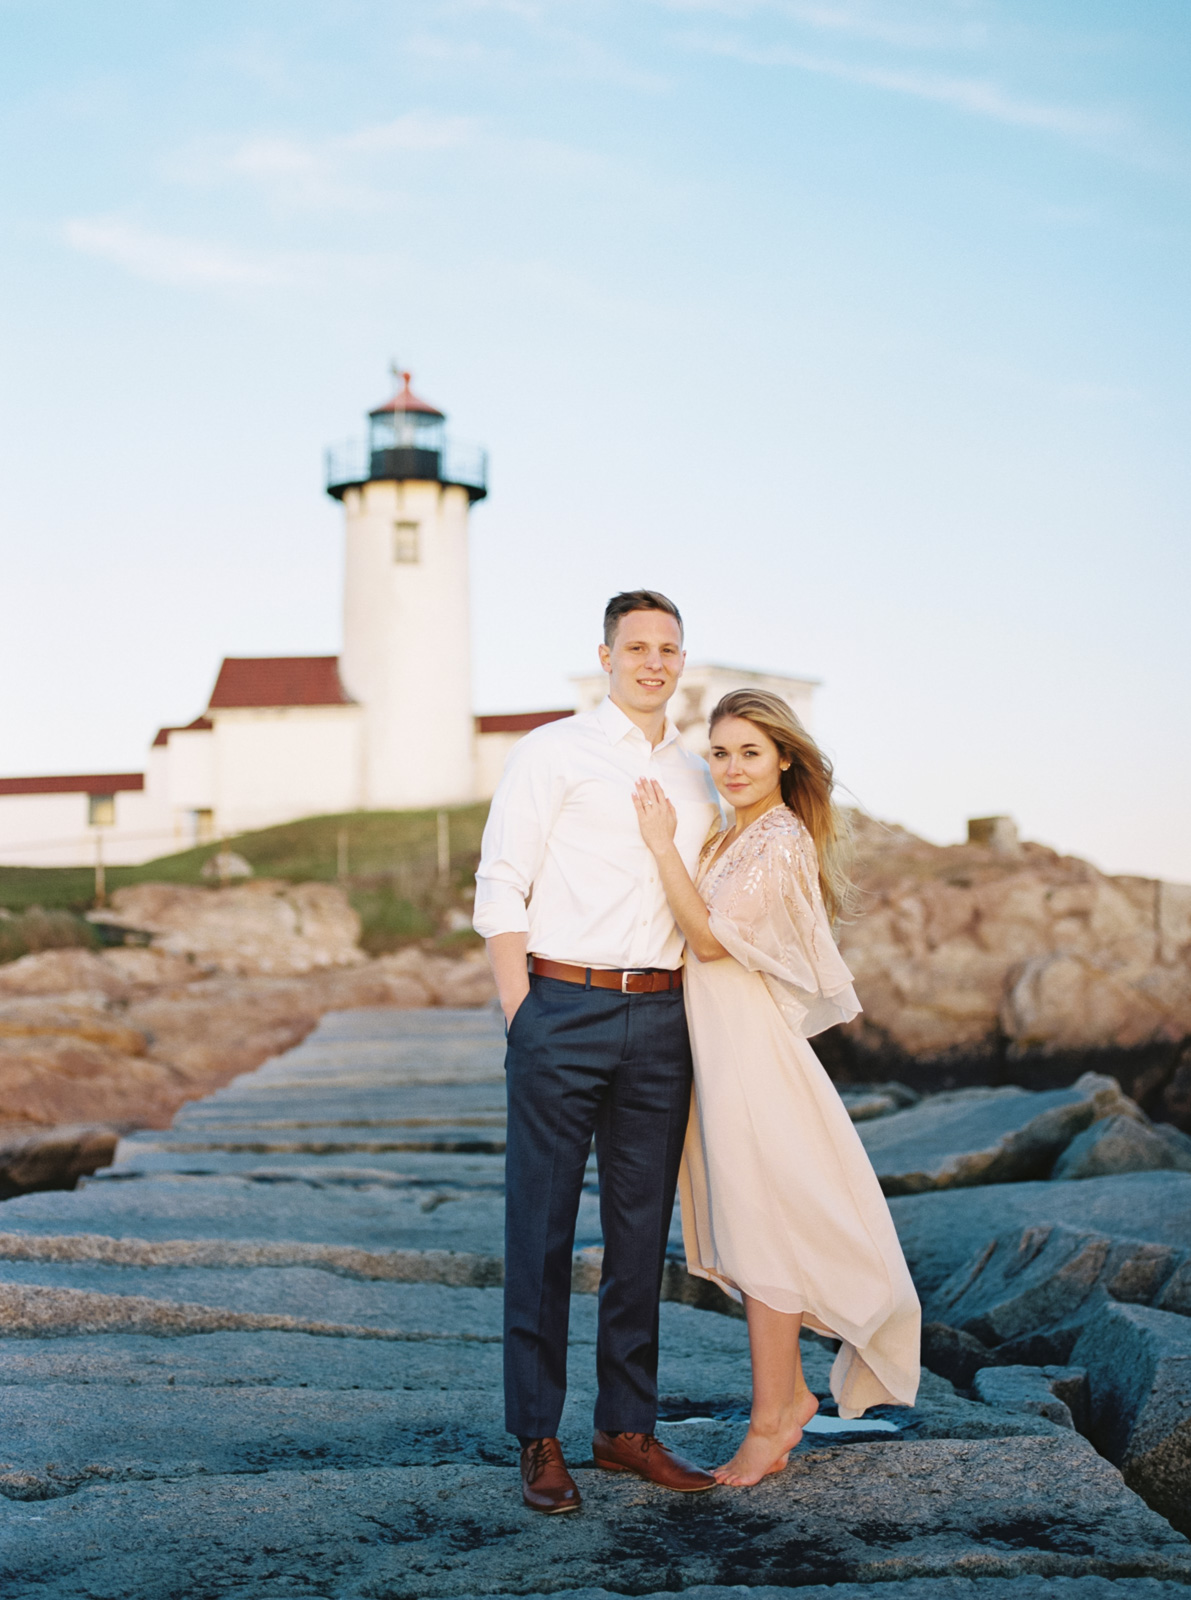 Eastern Point Lighthouse Destination Engagement Session-55.jpg